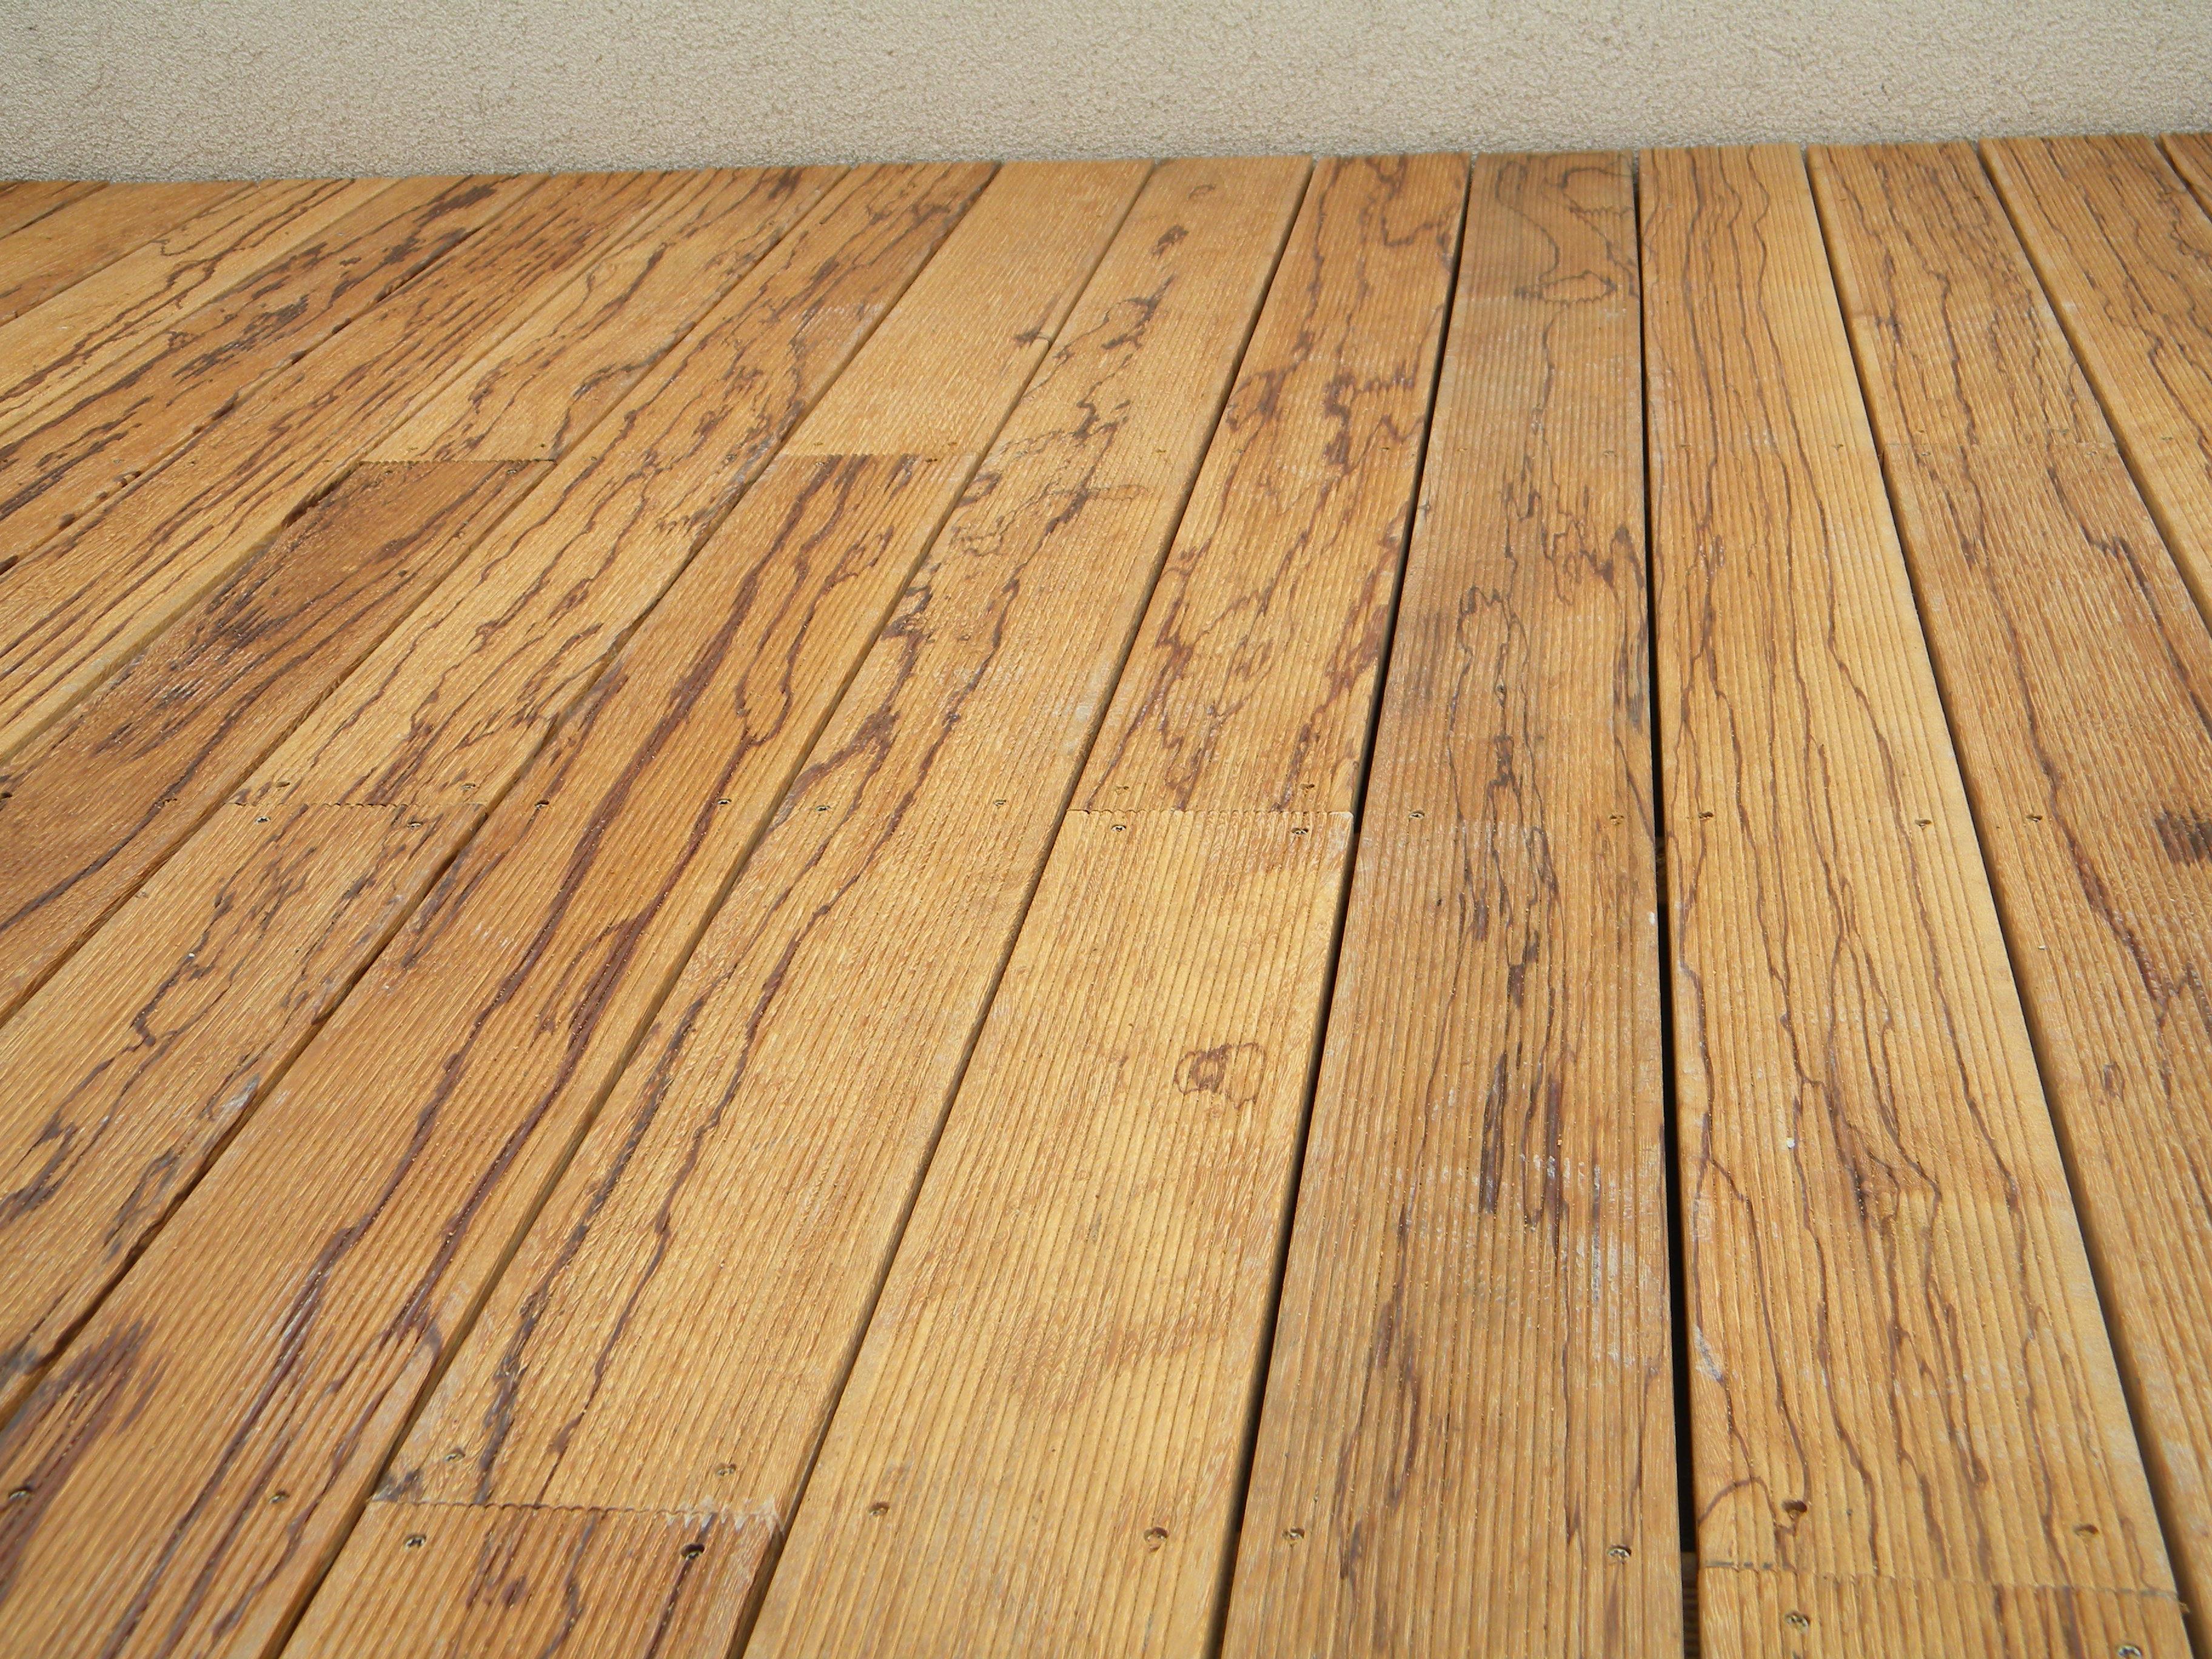 Deck-uri lemn - Angelim Rajado SELVA FLOORS - Poza 46